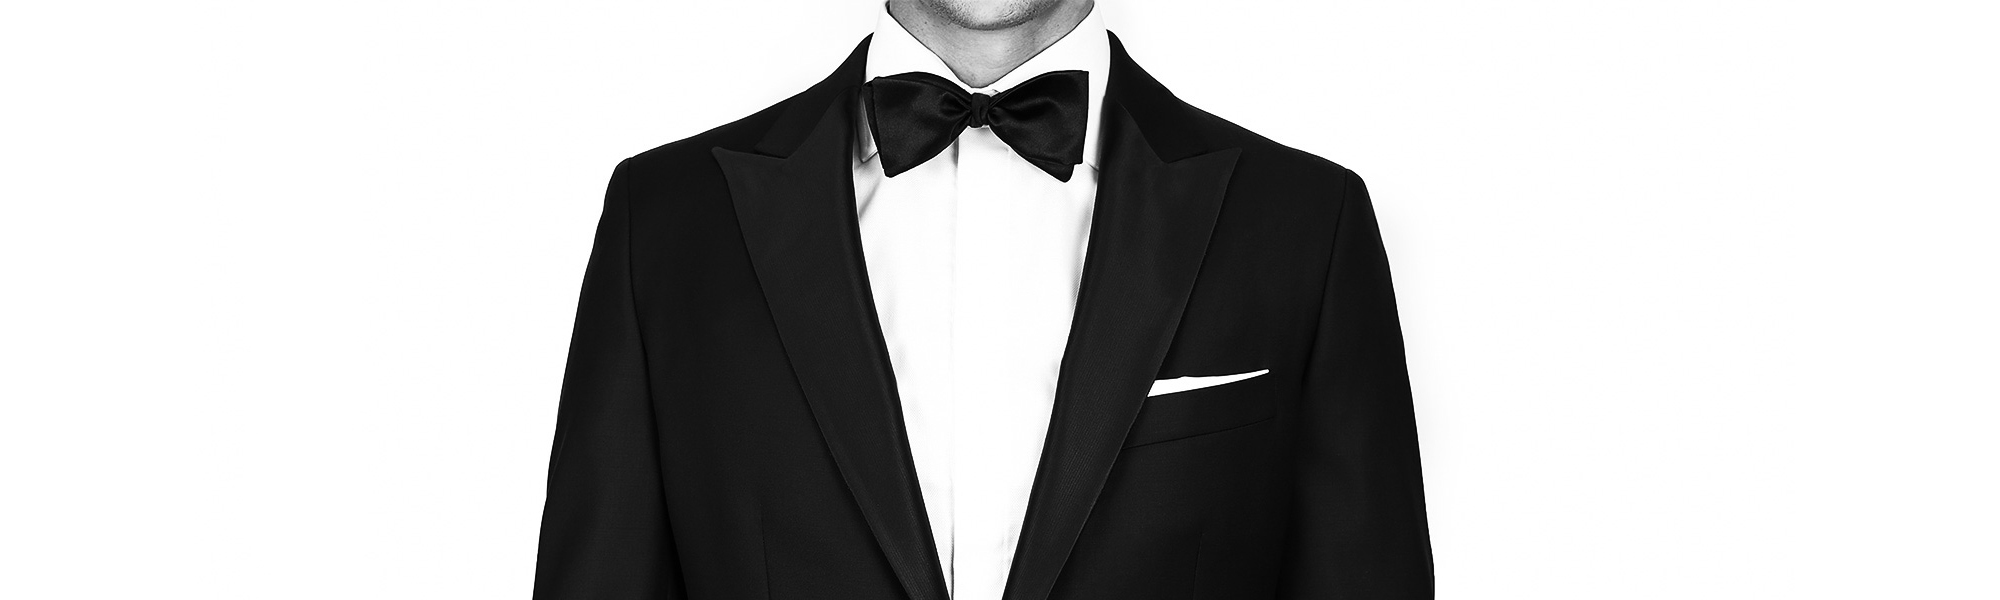 Black Tie Ball